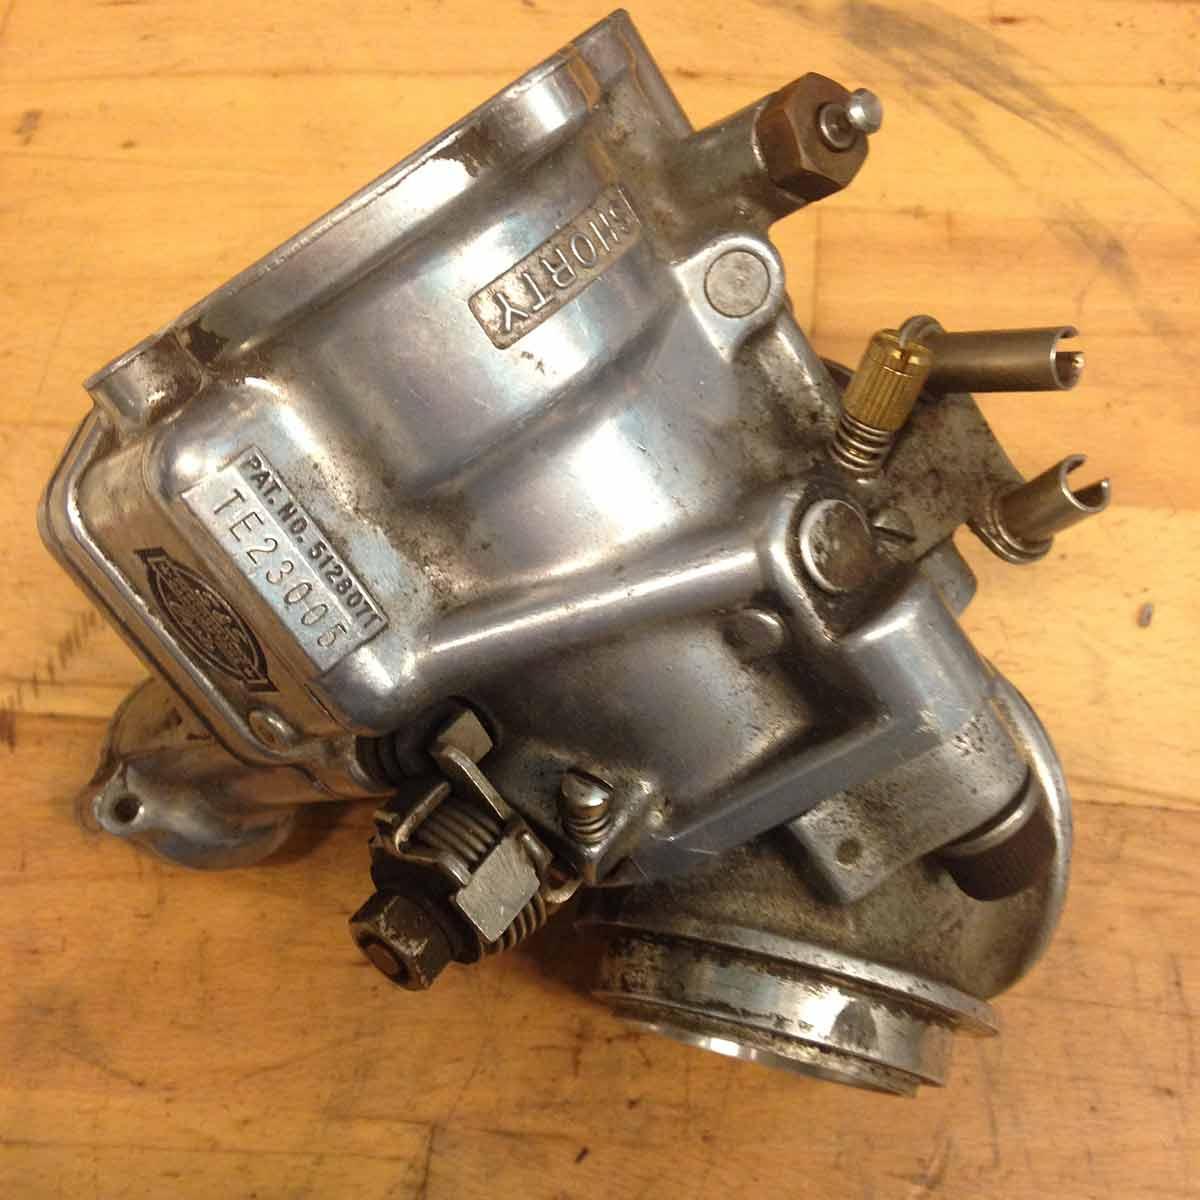 Harley Davidson S&S karburator - Før Aquanife vandpolering